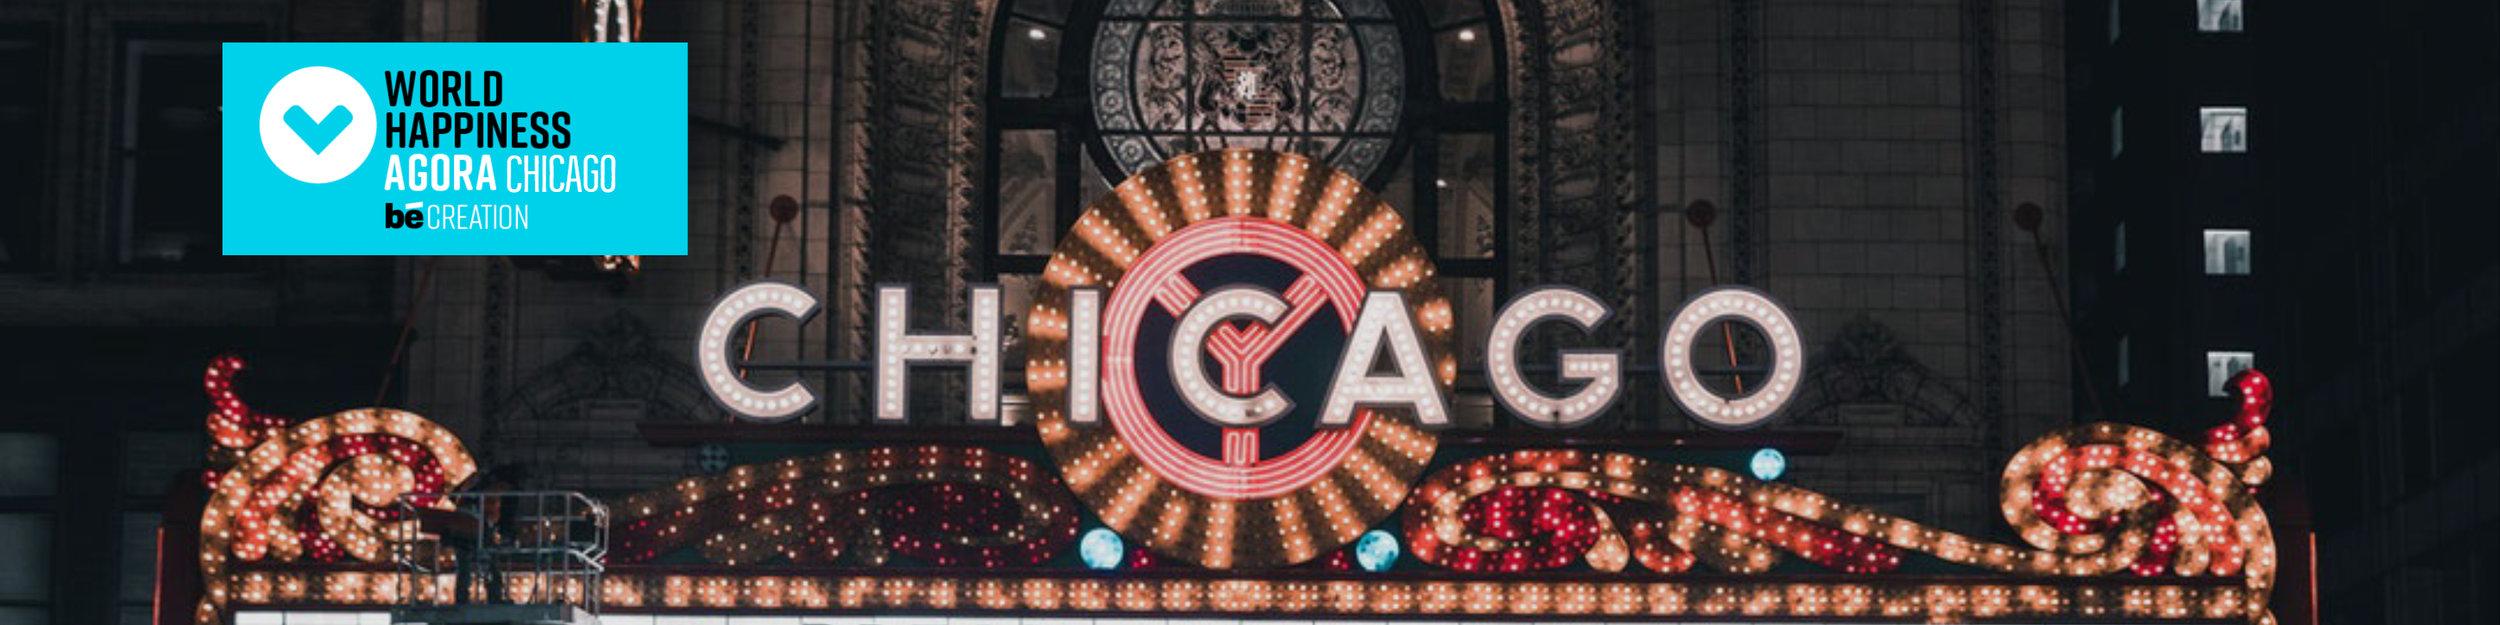 World Happiness Agora - United States - Chicago